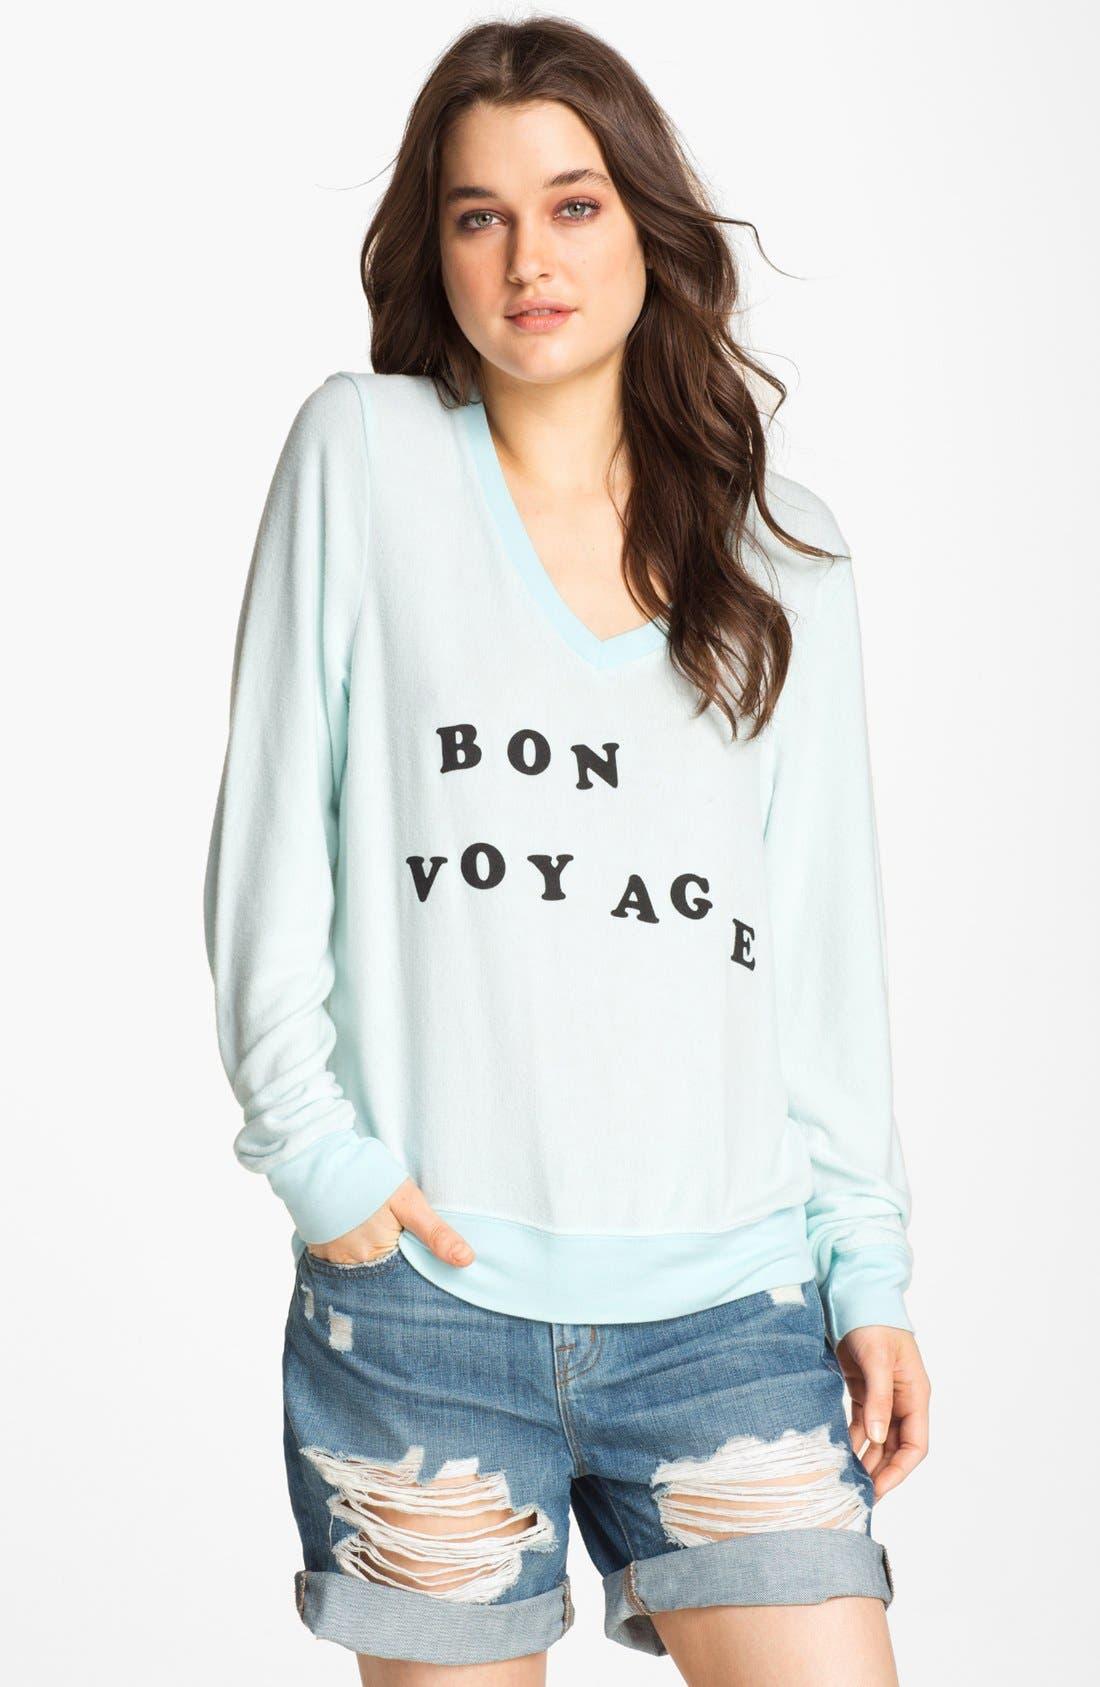 Alternate Image 1 Selected - Wildfox 'Bon Voyage' Graphic Sweatshirt (Nordstrom Exclusive)